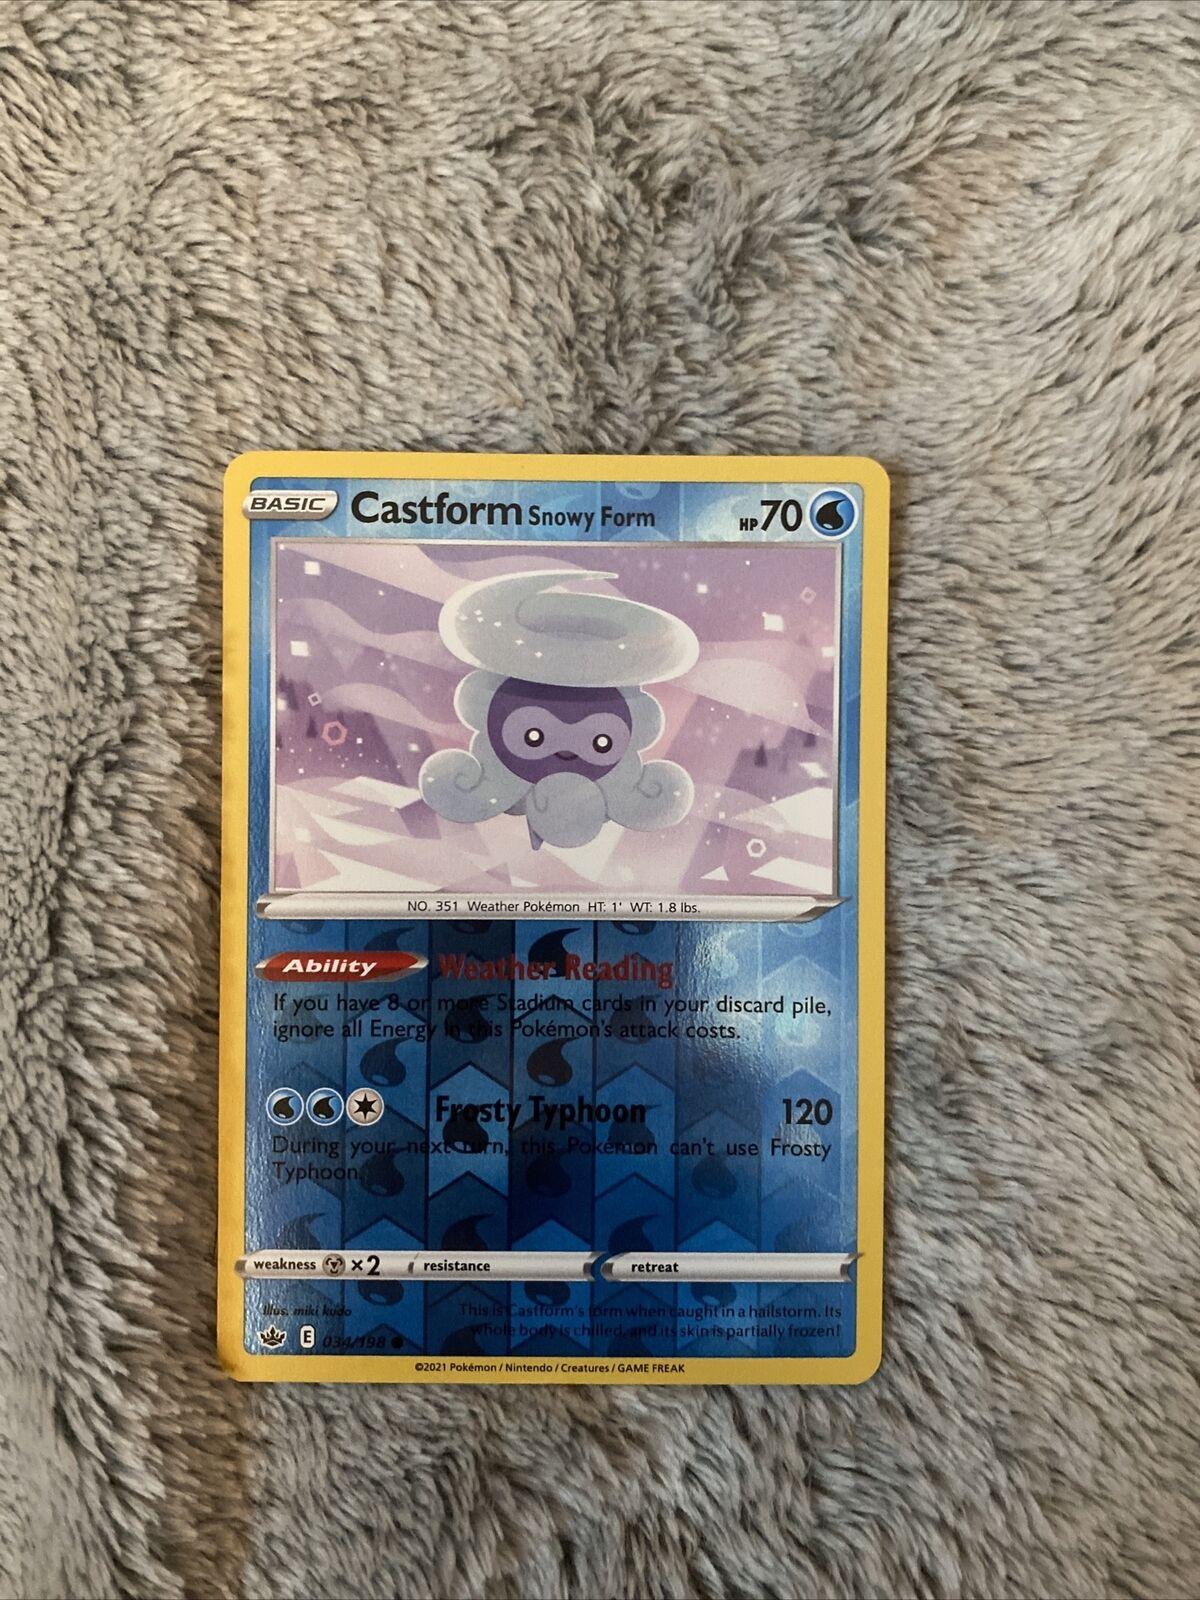 Pokemon - CASTFORM SNOWY FORM - 034/198 - Reverse Holo - Chilling Reign - NM/M - Image 1